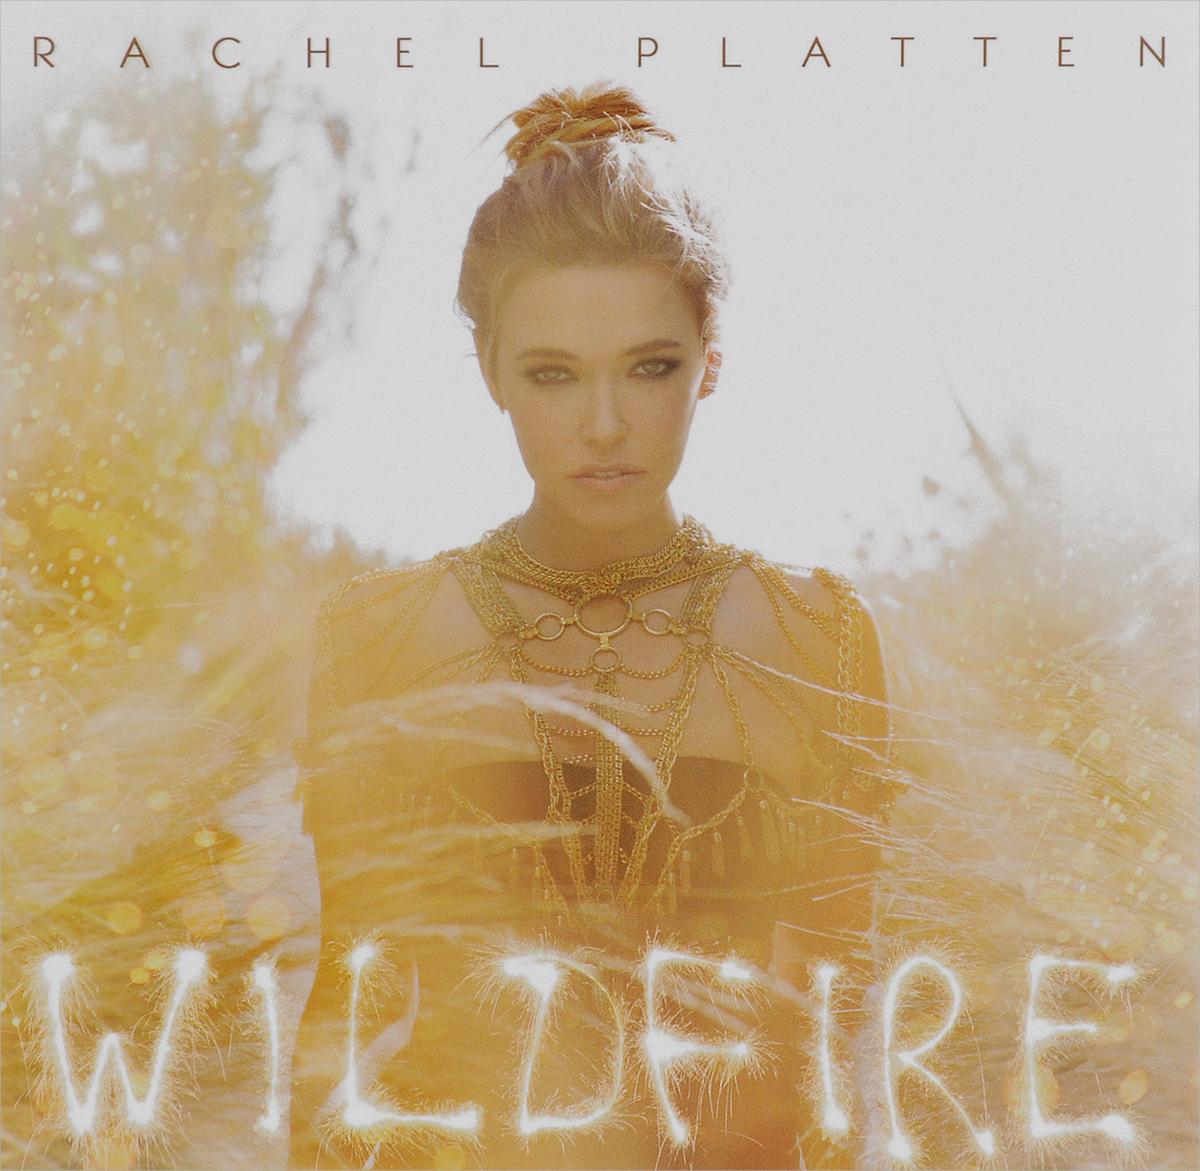 Rachel Platten Rachel Platten. Wildfire acana acana wild pacifica dog all breeds wild caught fish для собак всех пород и возрастов на основе рыбы 11 4 кг